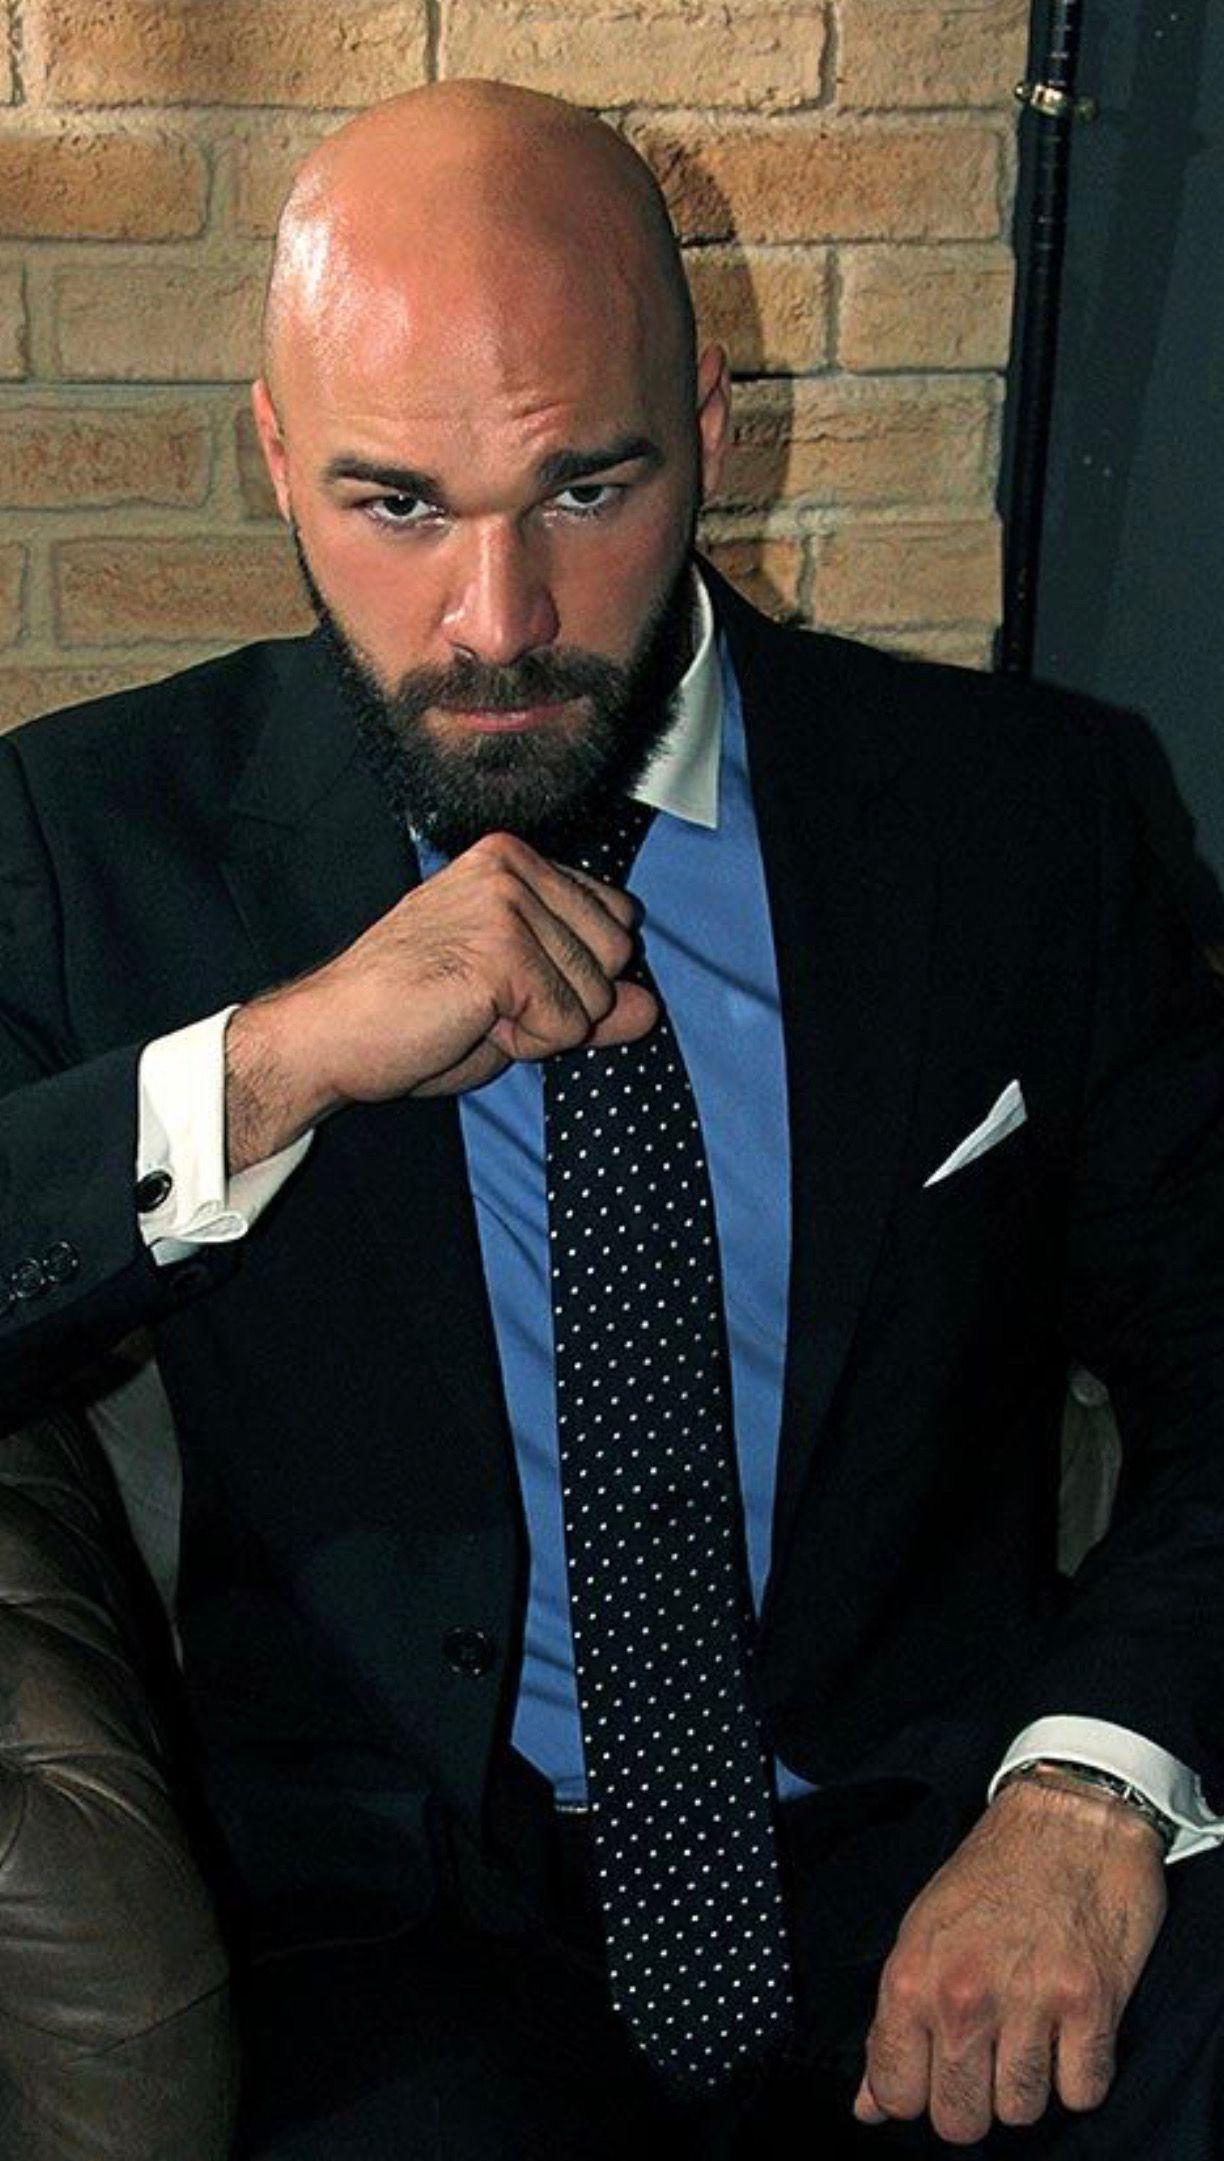 Max Duro Bald Men With Beards Bald Men Style Bald With Beard